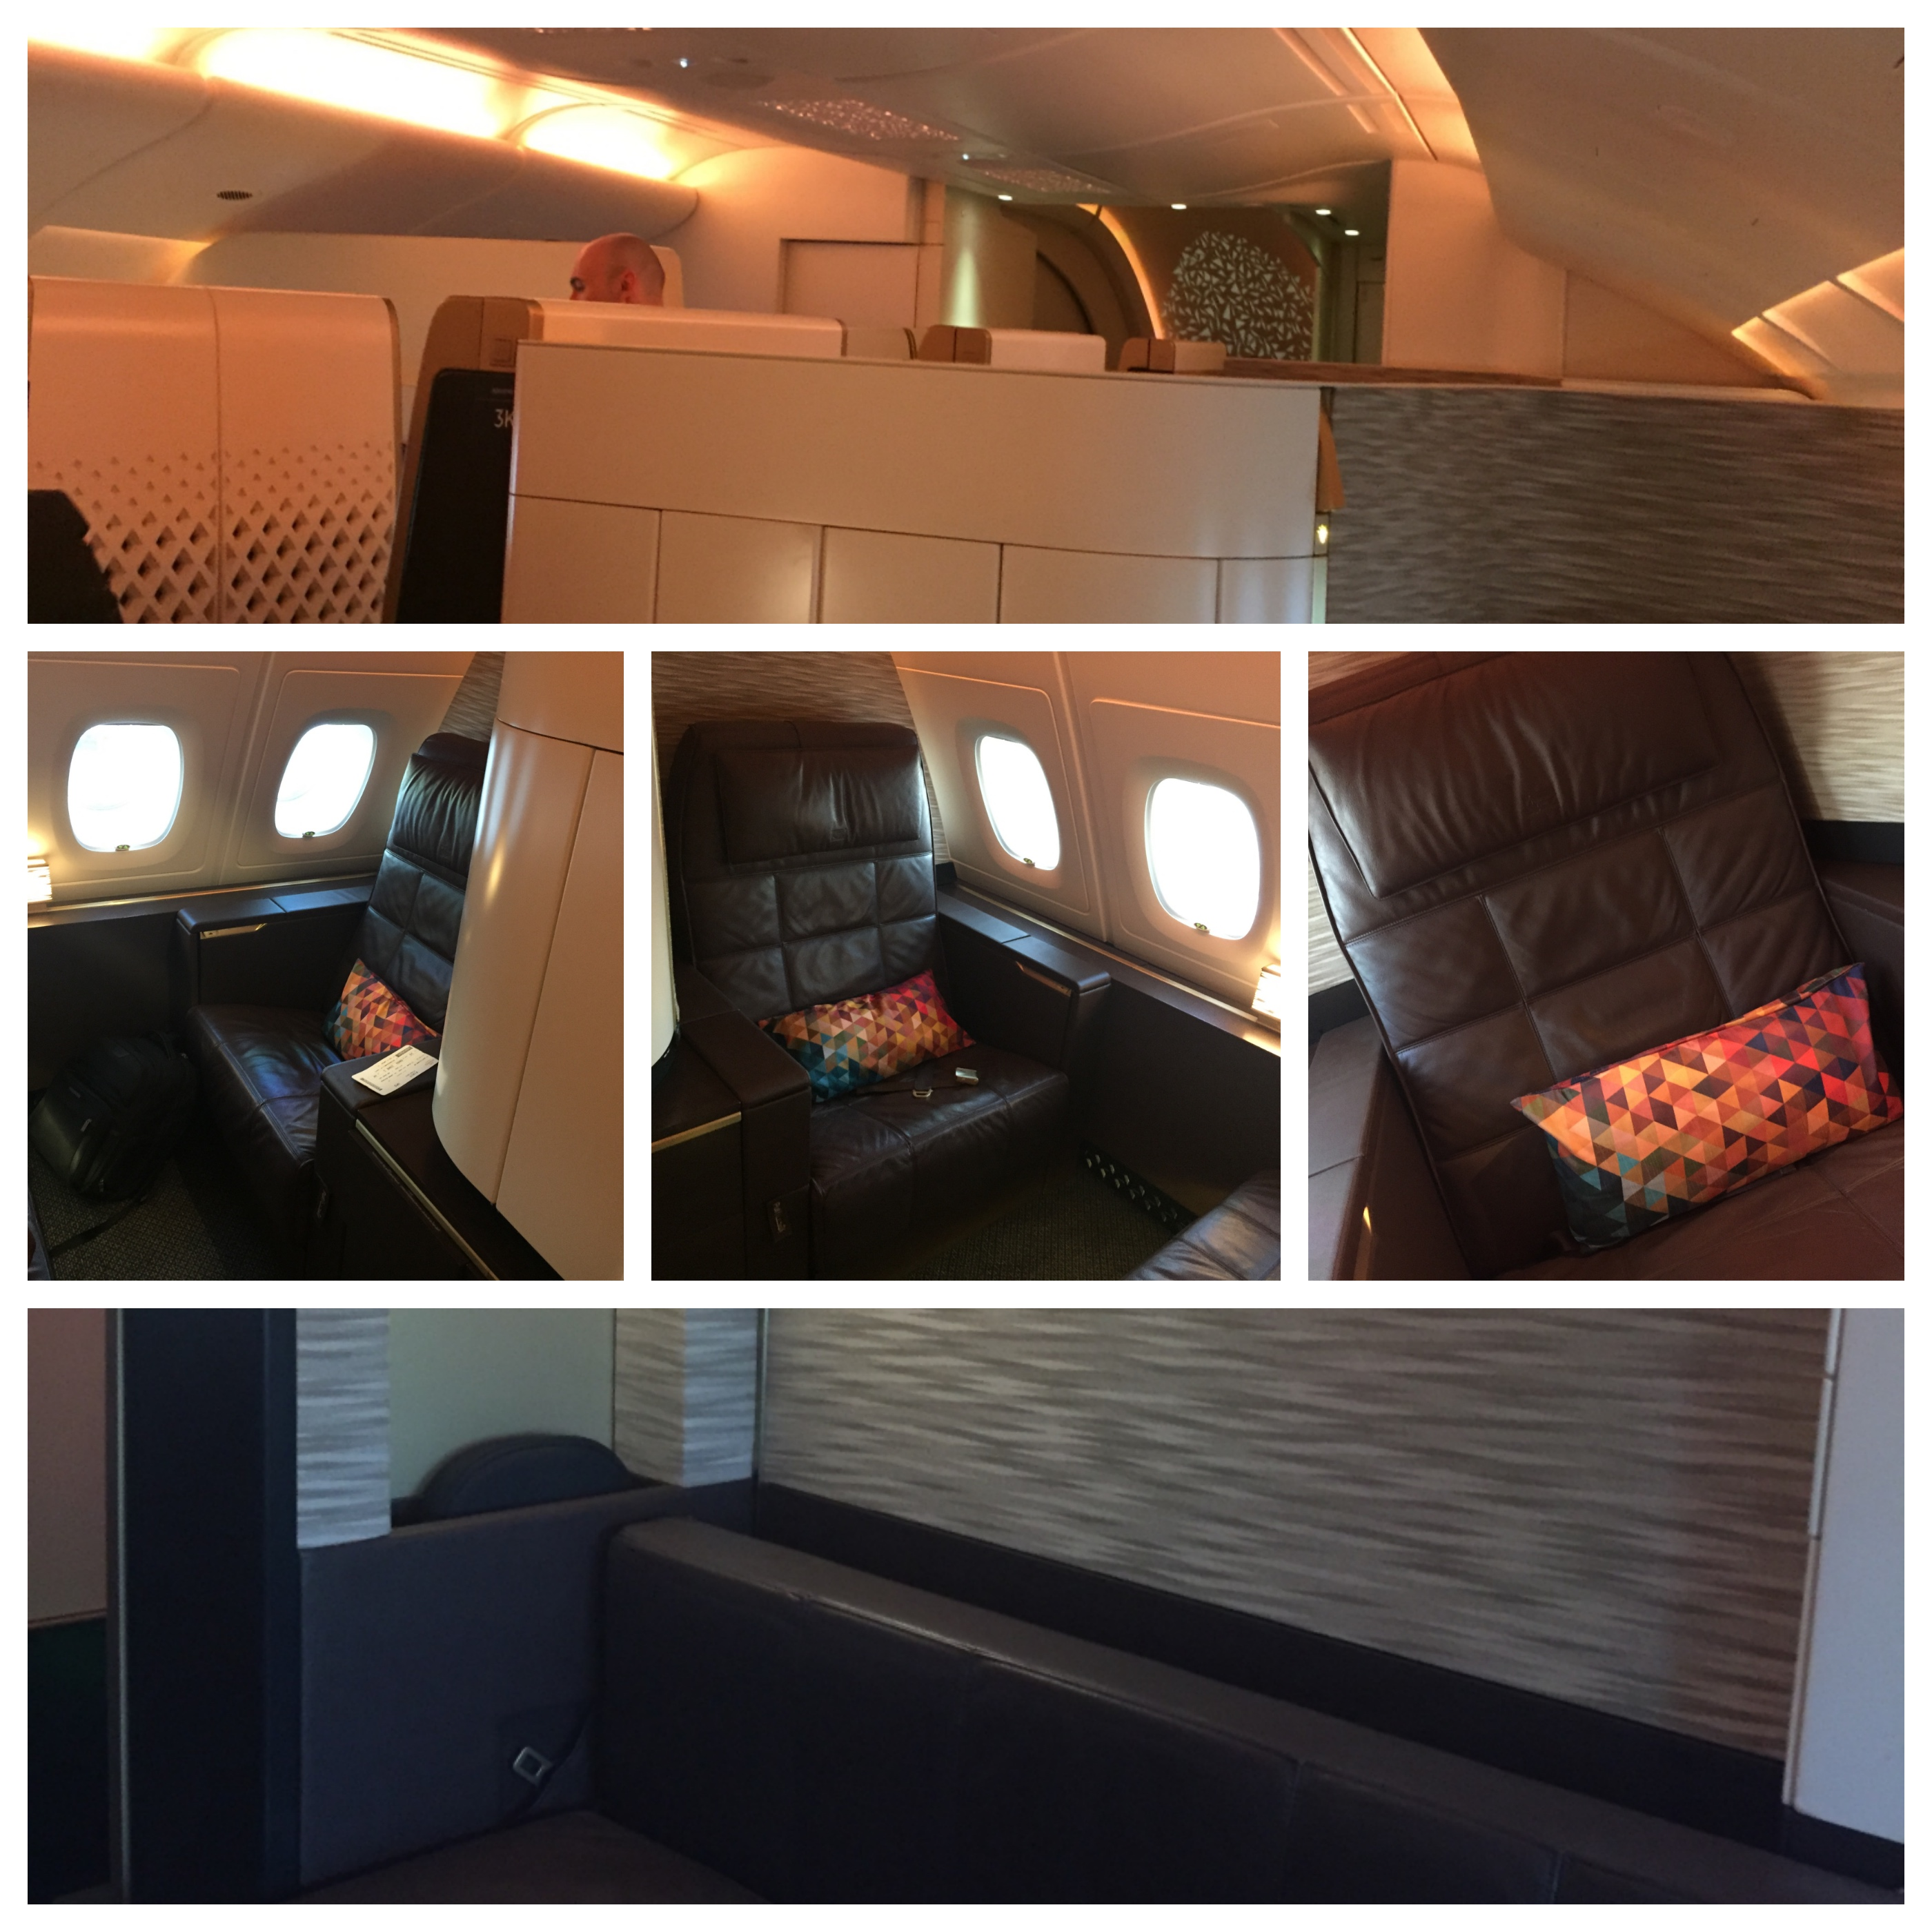 Pic etihad airways a380 first class apartment 4k may 2015 - Etihad A380 1